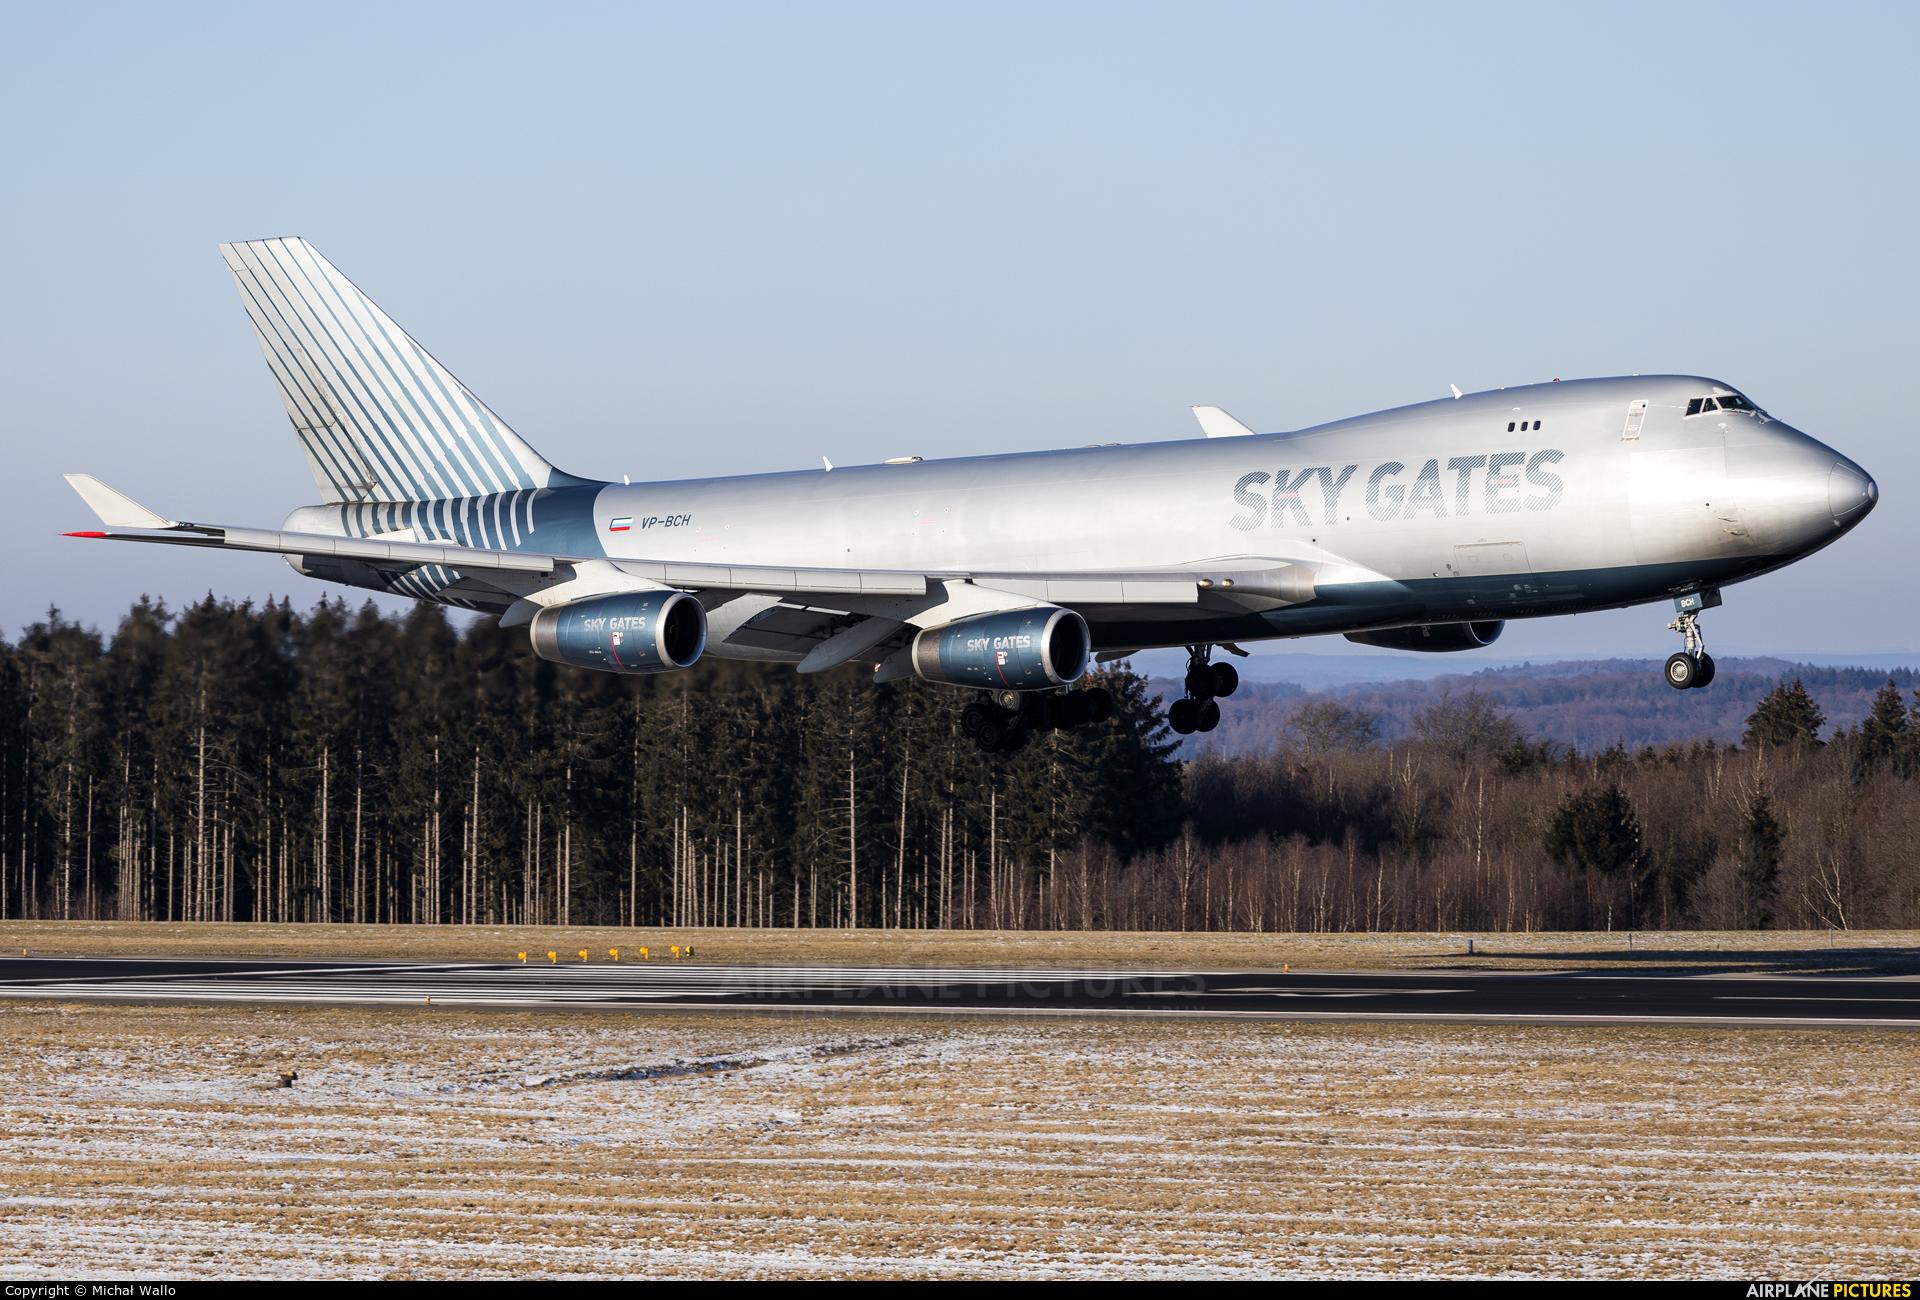 Sky Gates Airlines VP-BCH aircraft at Frankfurt - Hahn